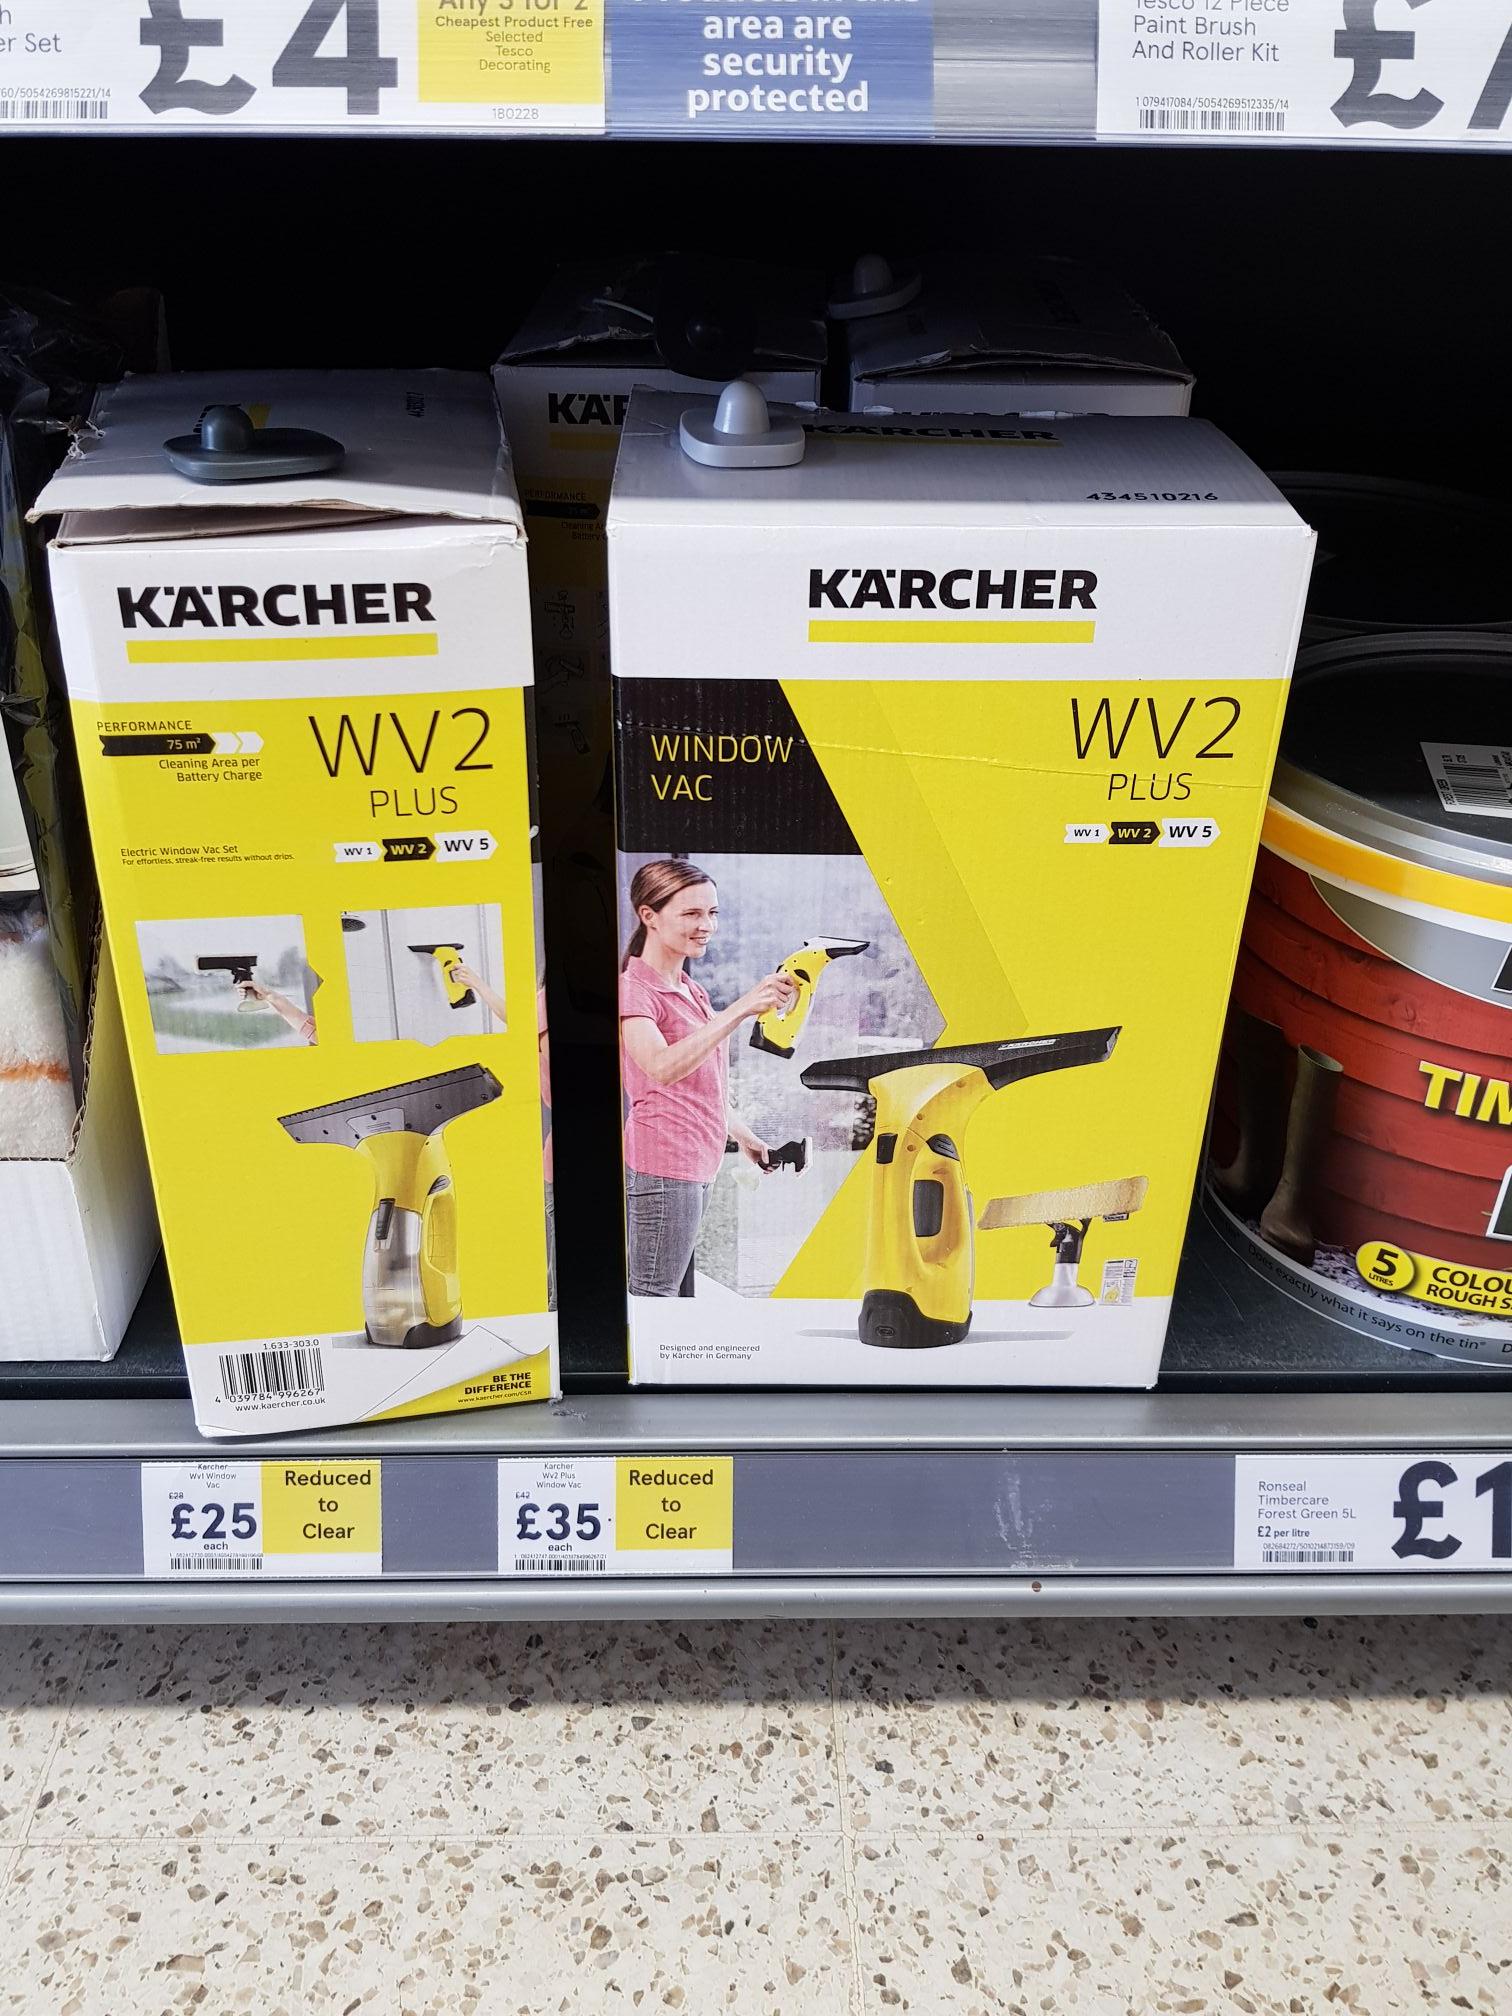 Karcher Window VAC £35 WV2 Tesco Edinburgh in-store